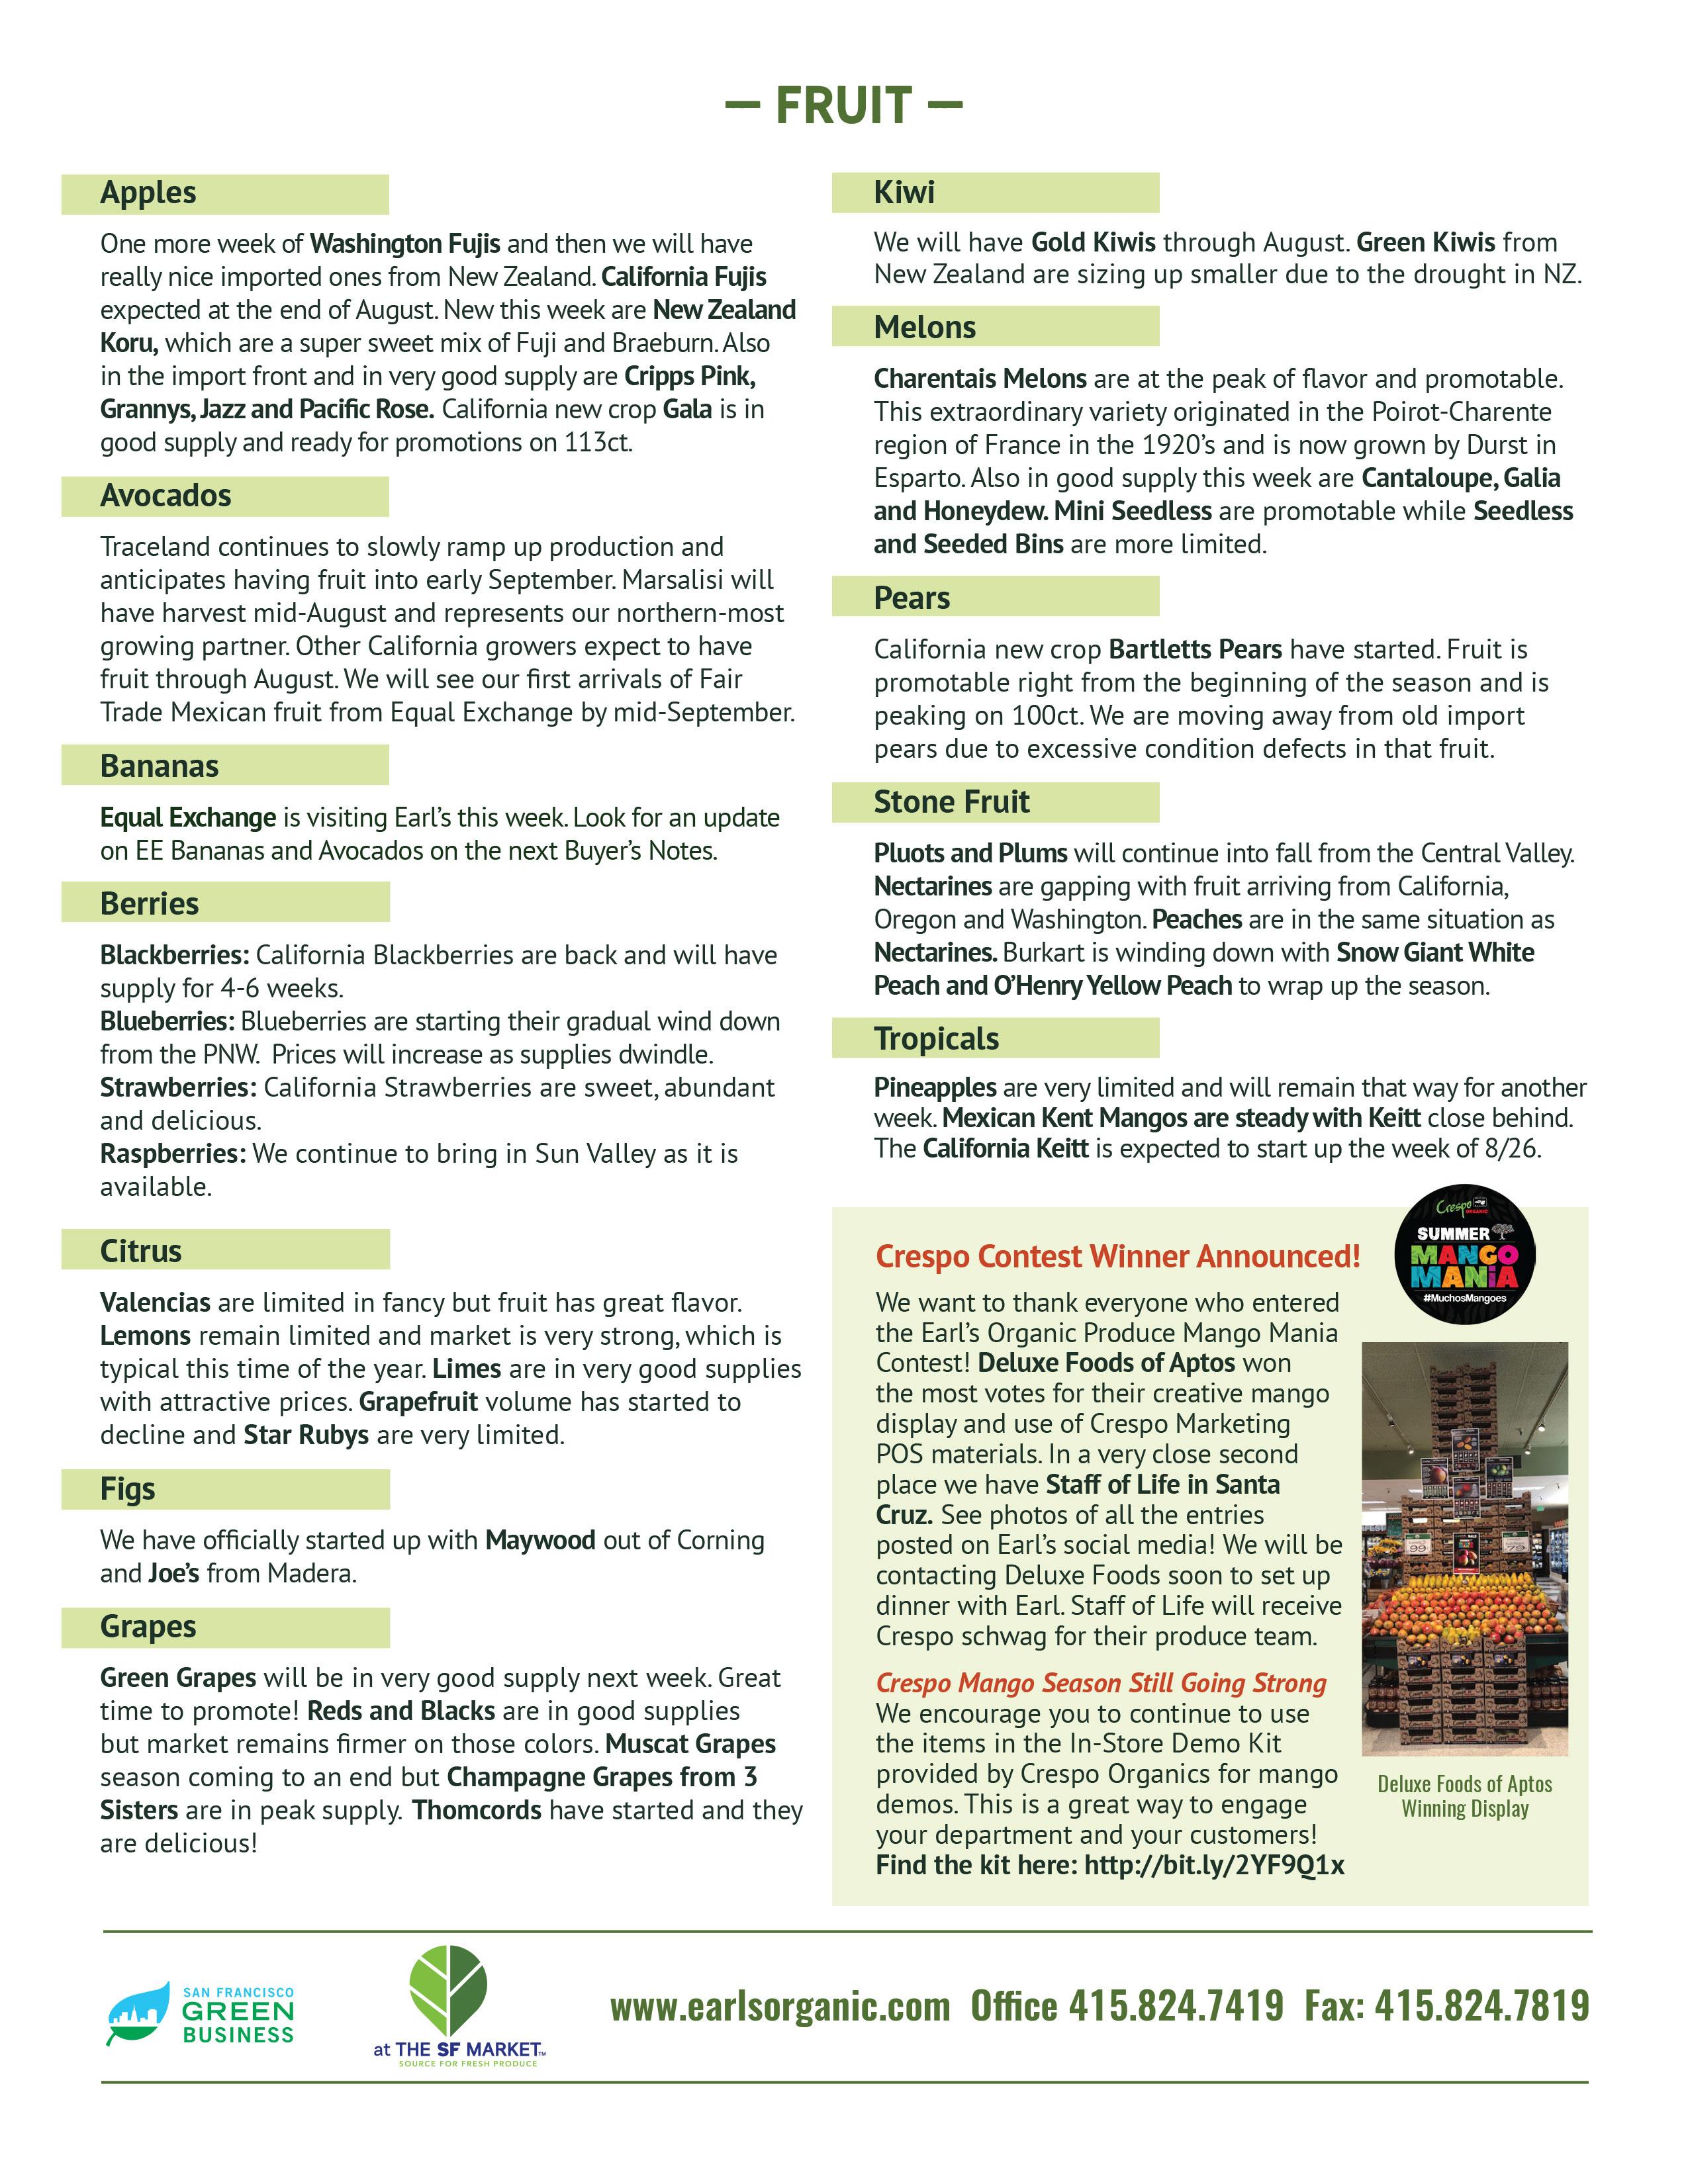 Organic News & Updates « Earl's Organic Produce